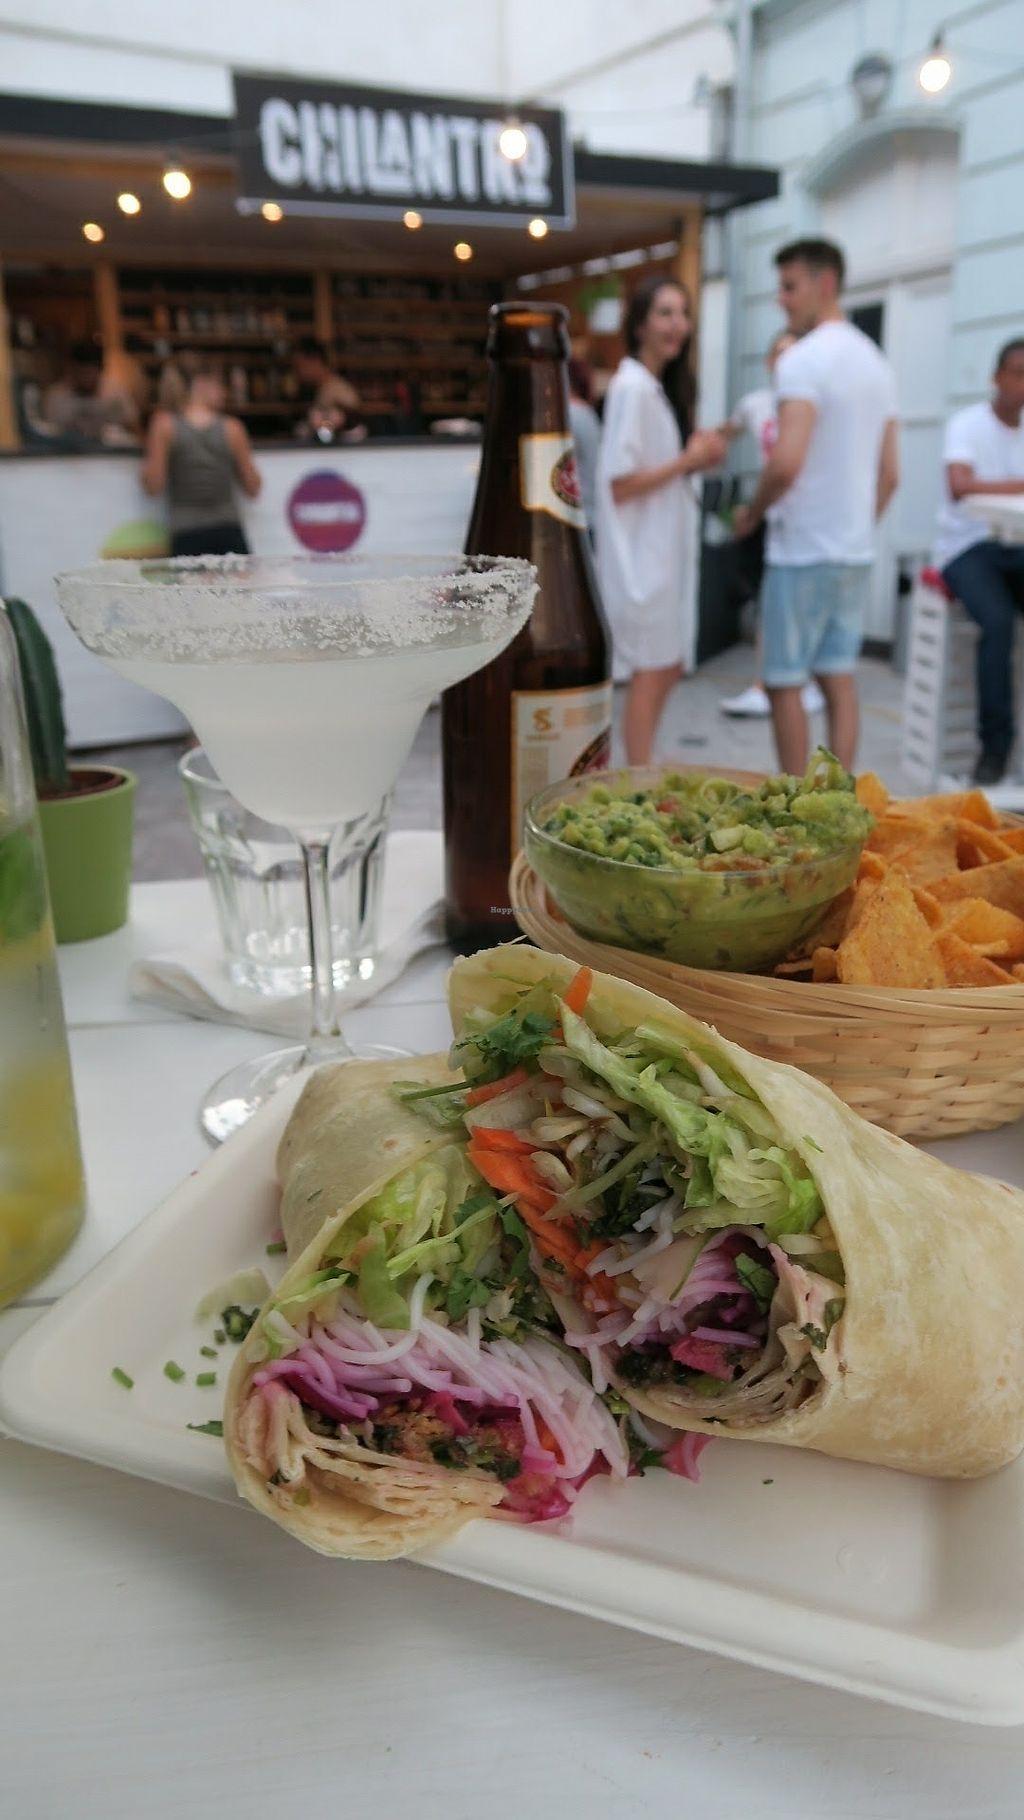 "Photo of Chilantro Garden Bar  by <a href=""/members/profile/Nikolate"">Nikolate</a> <br/>Guacamole with nachos and asian fusion burrito <br/> September 13, 2017  - <a href='/contact/abuse/image/97010/304017'>Report</a>"